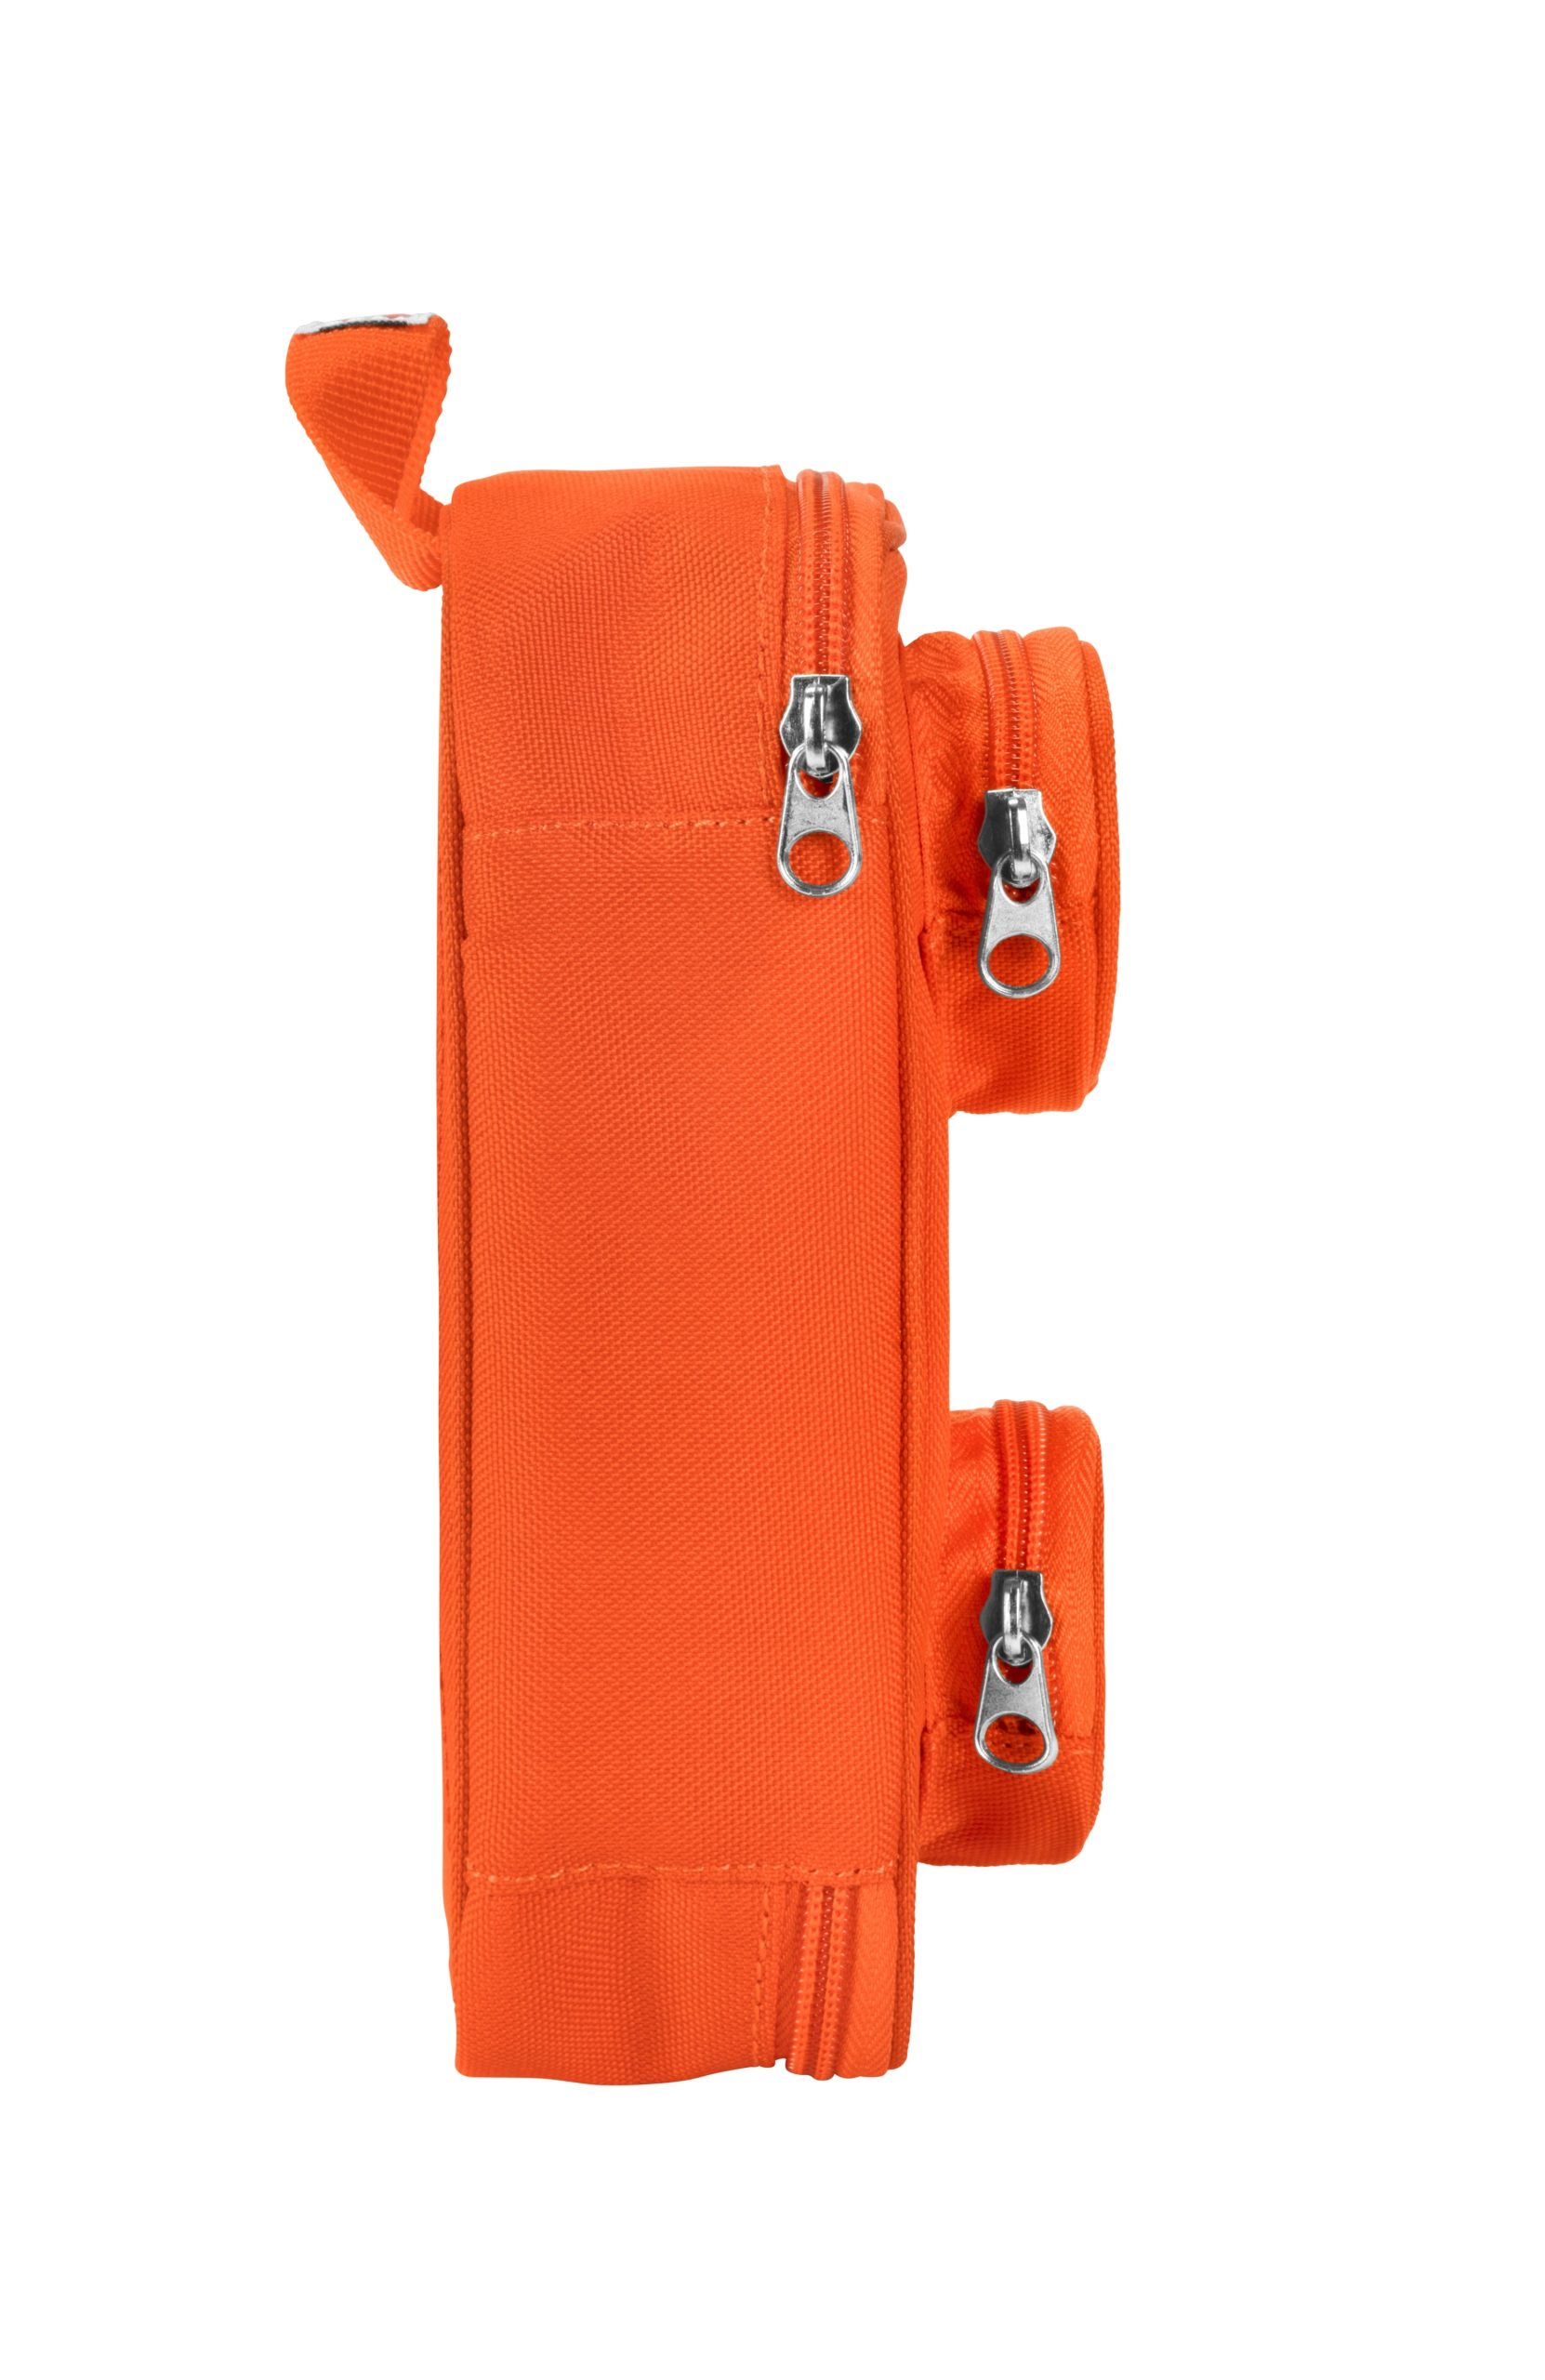 lego 5005511 brick pouch orange scaled